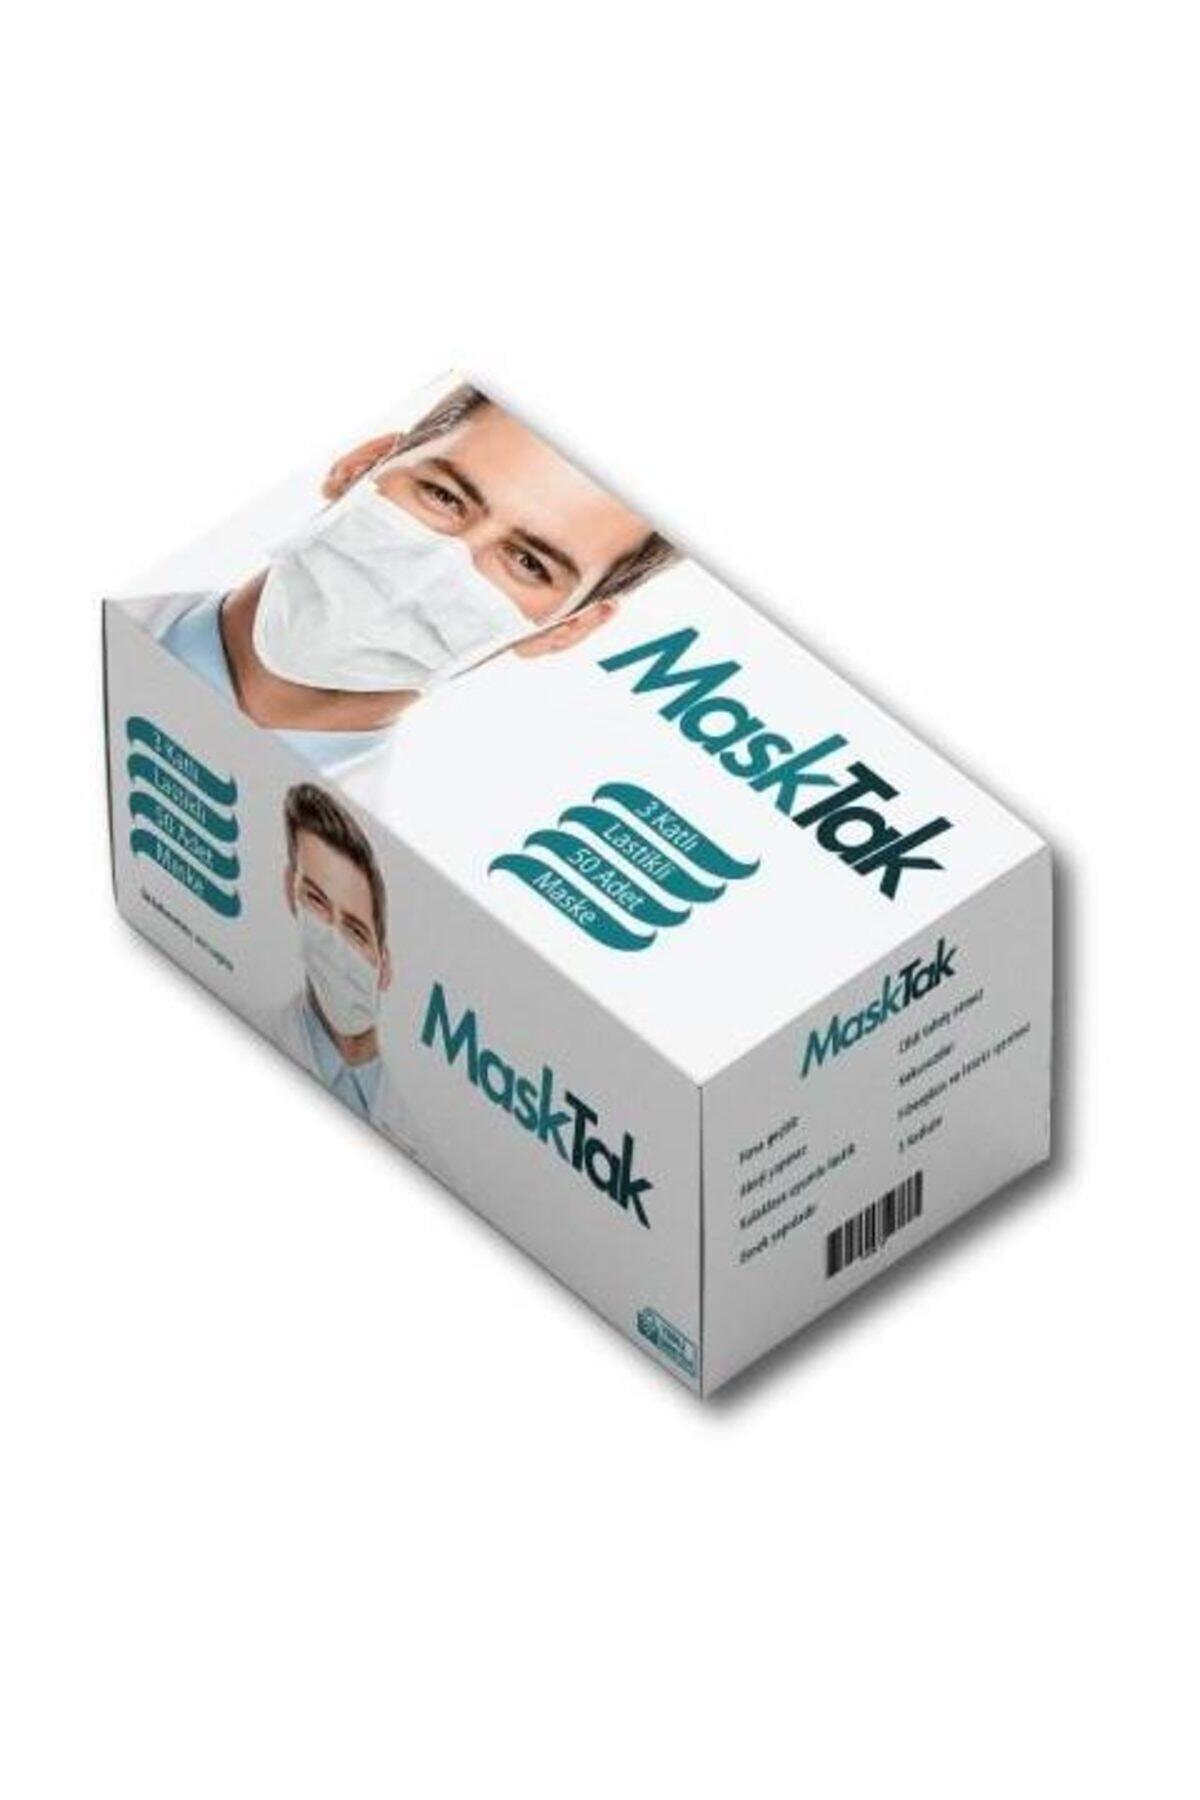 masktak 3 Katlı Telli Cerrahi Maske 1 Kutu 50 Adet 1